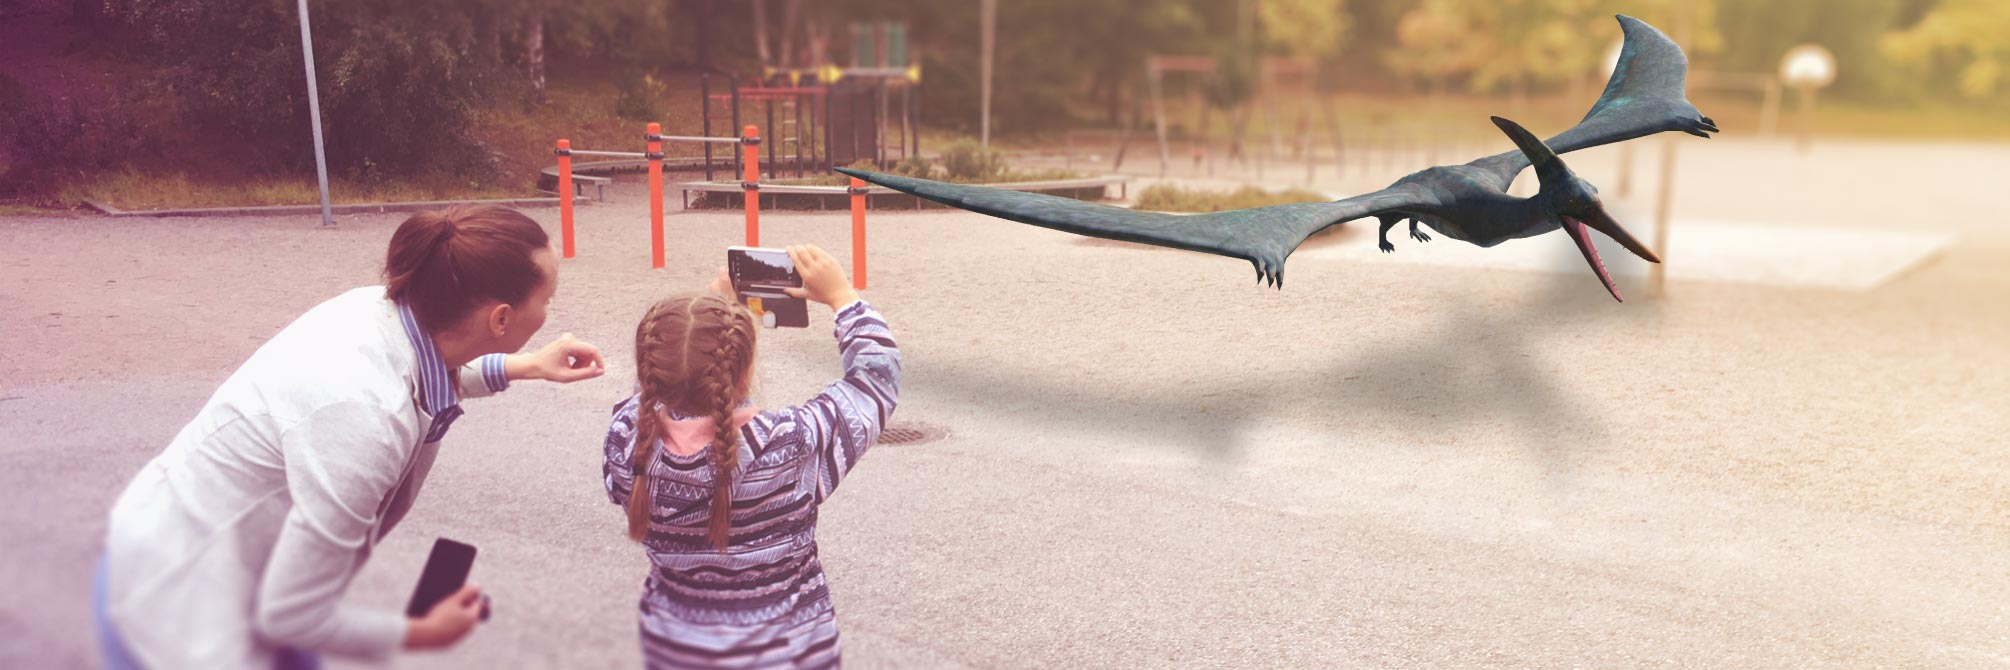 3DBear - Creative Storytelling in Augmented Reality (AR)